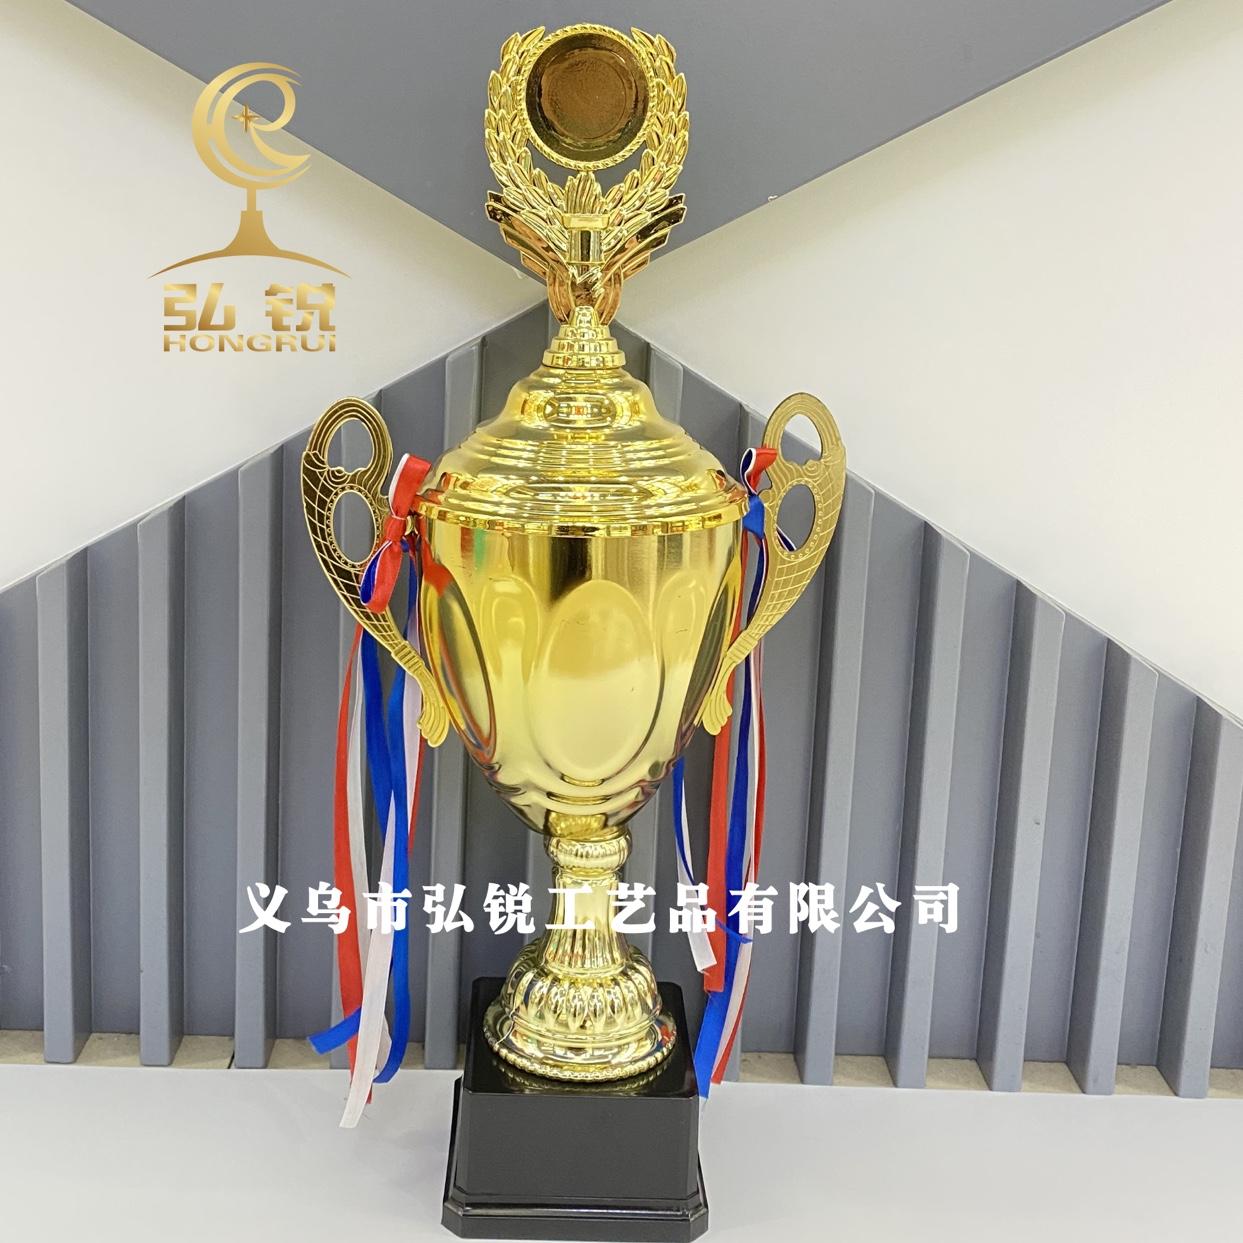 HR-855A金属奖杯16*53CM活动比赛竞技奖励奖杯可定制logo